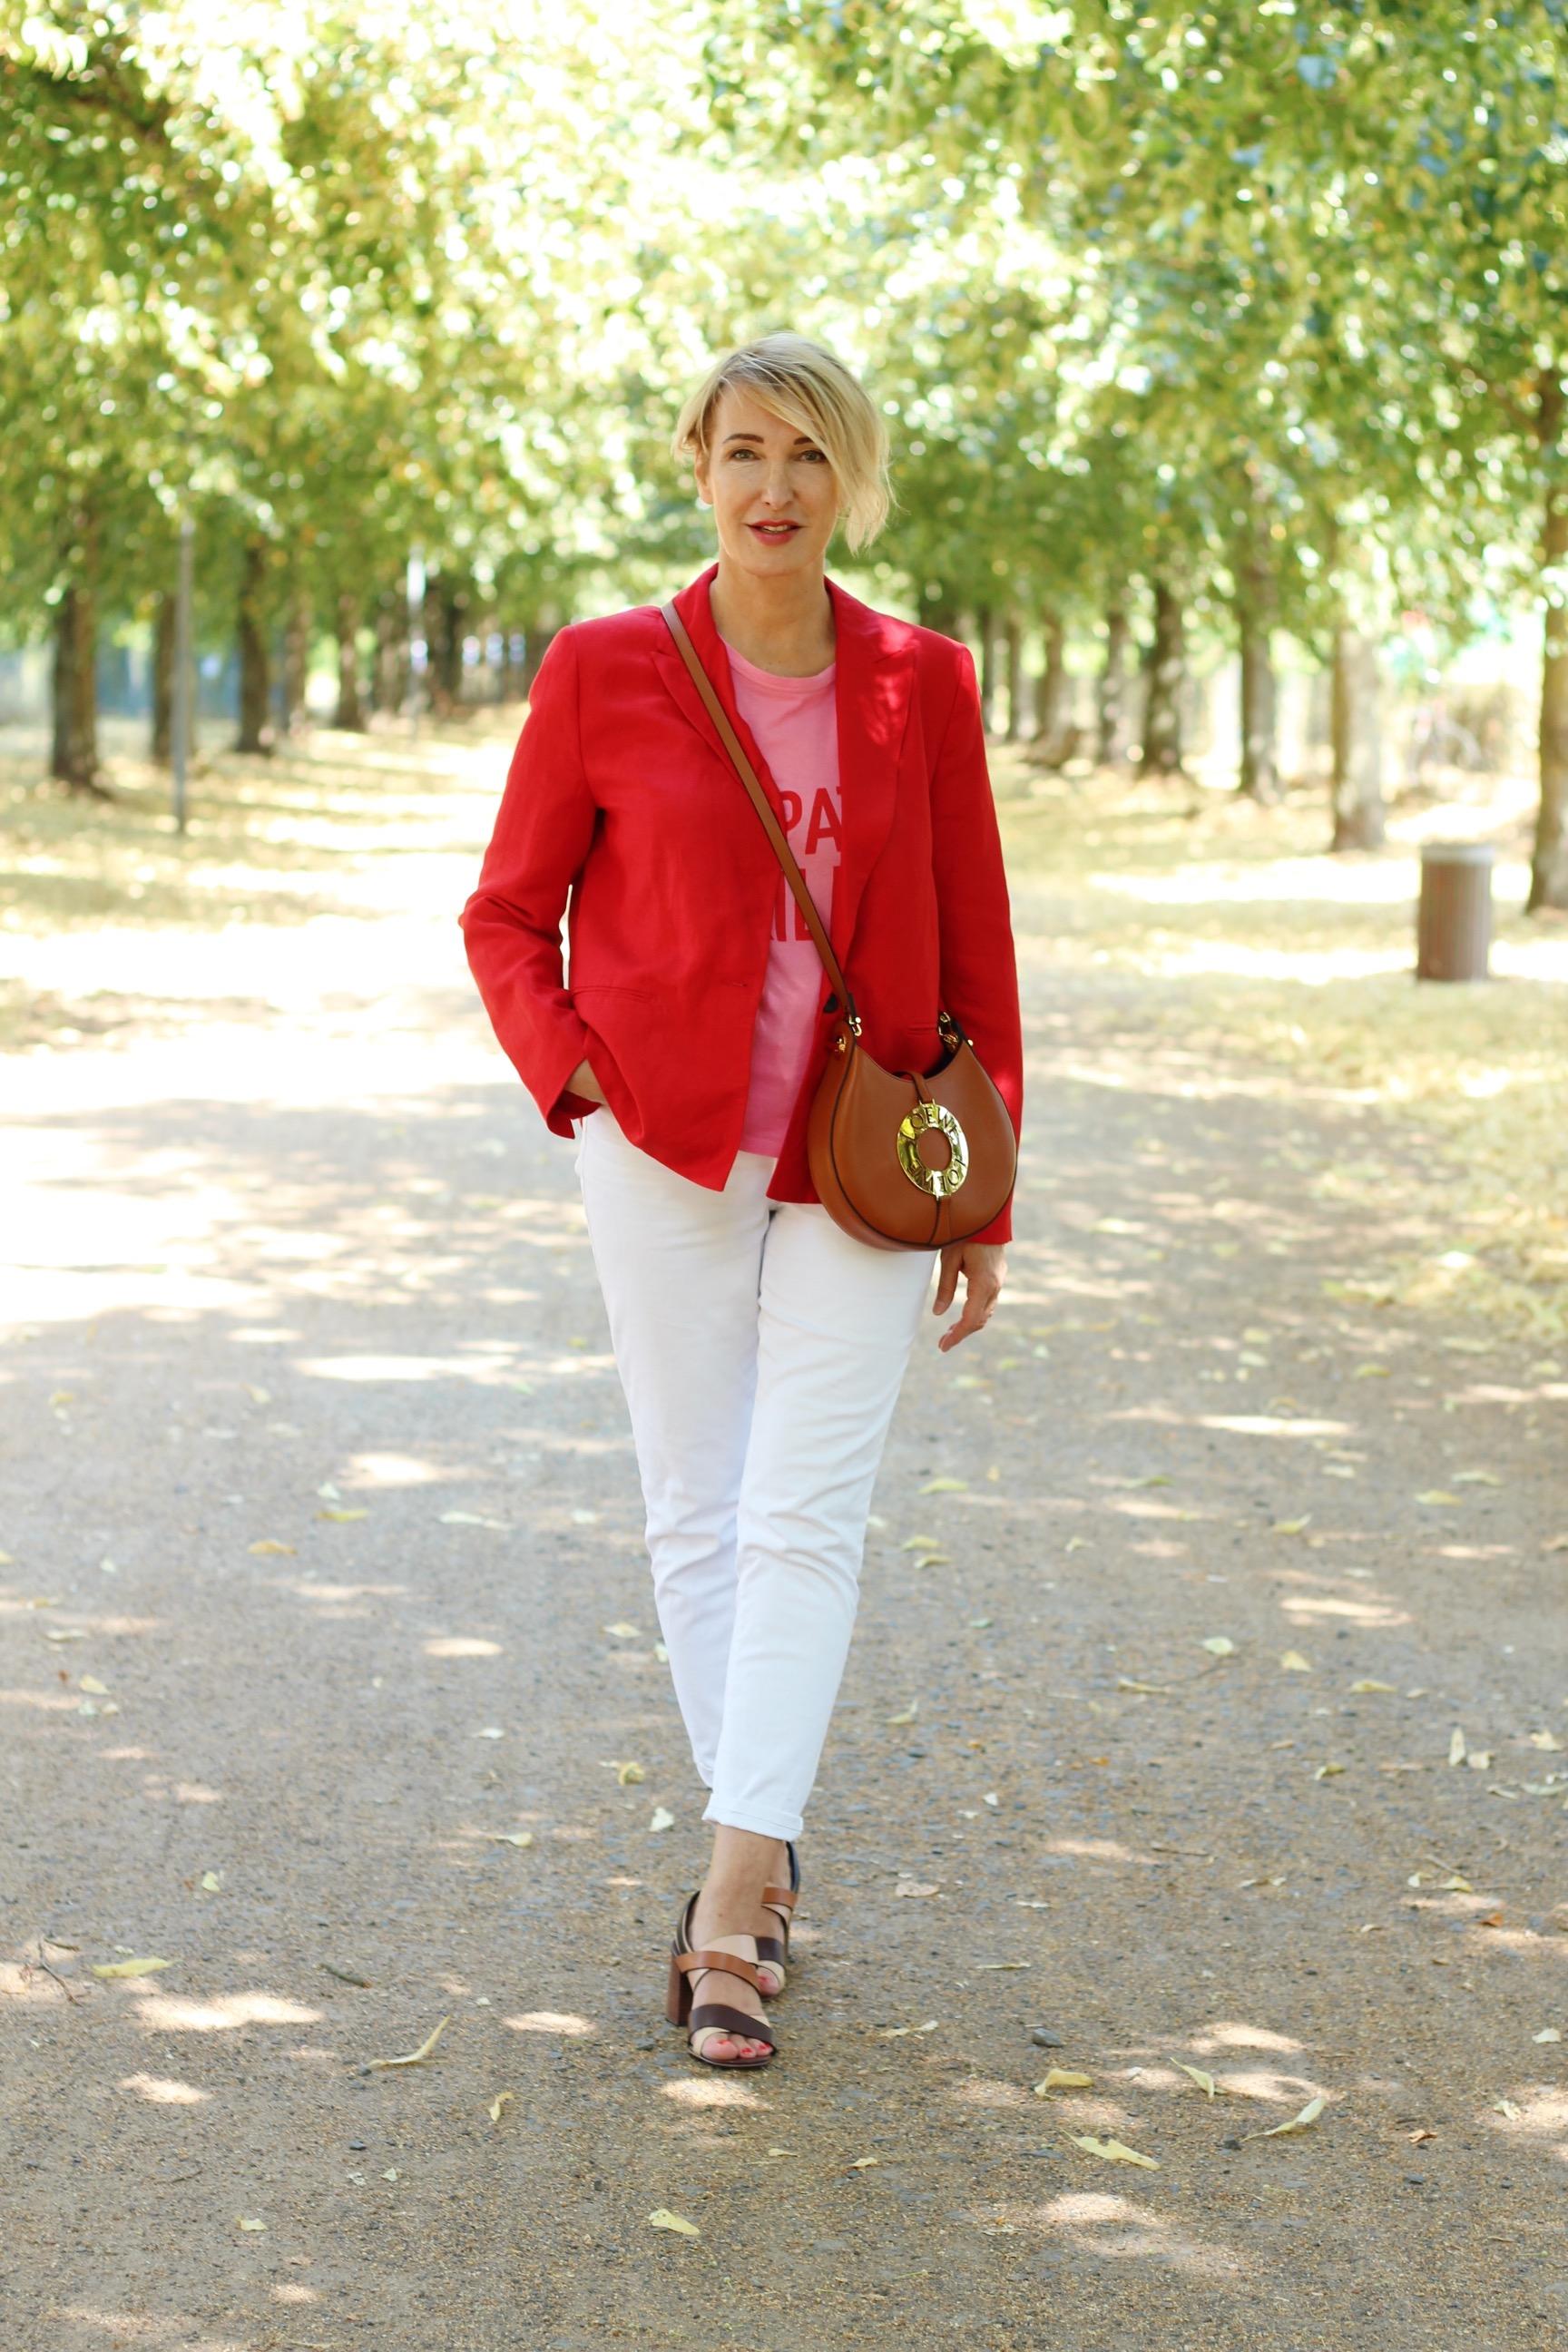 glamupyourlifestyle weiße-jeans roter-blazer sommer-outfit ue-40-blog ue-50-blog Fashionblog ü-40